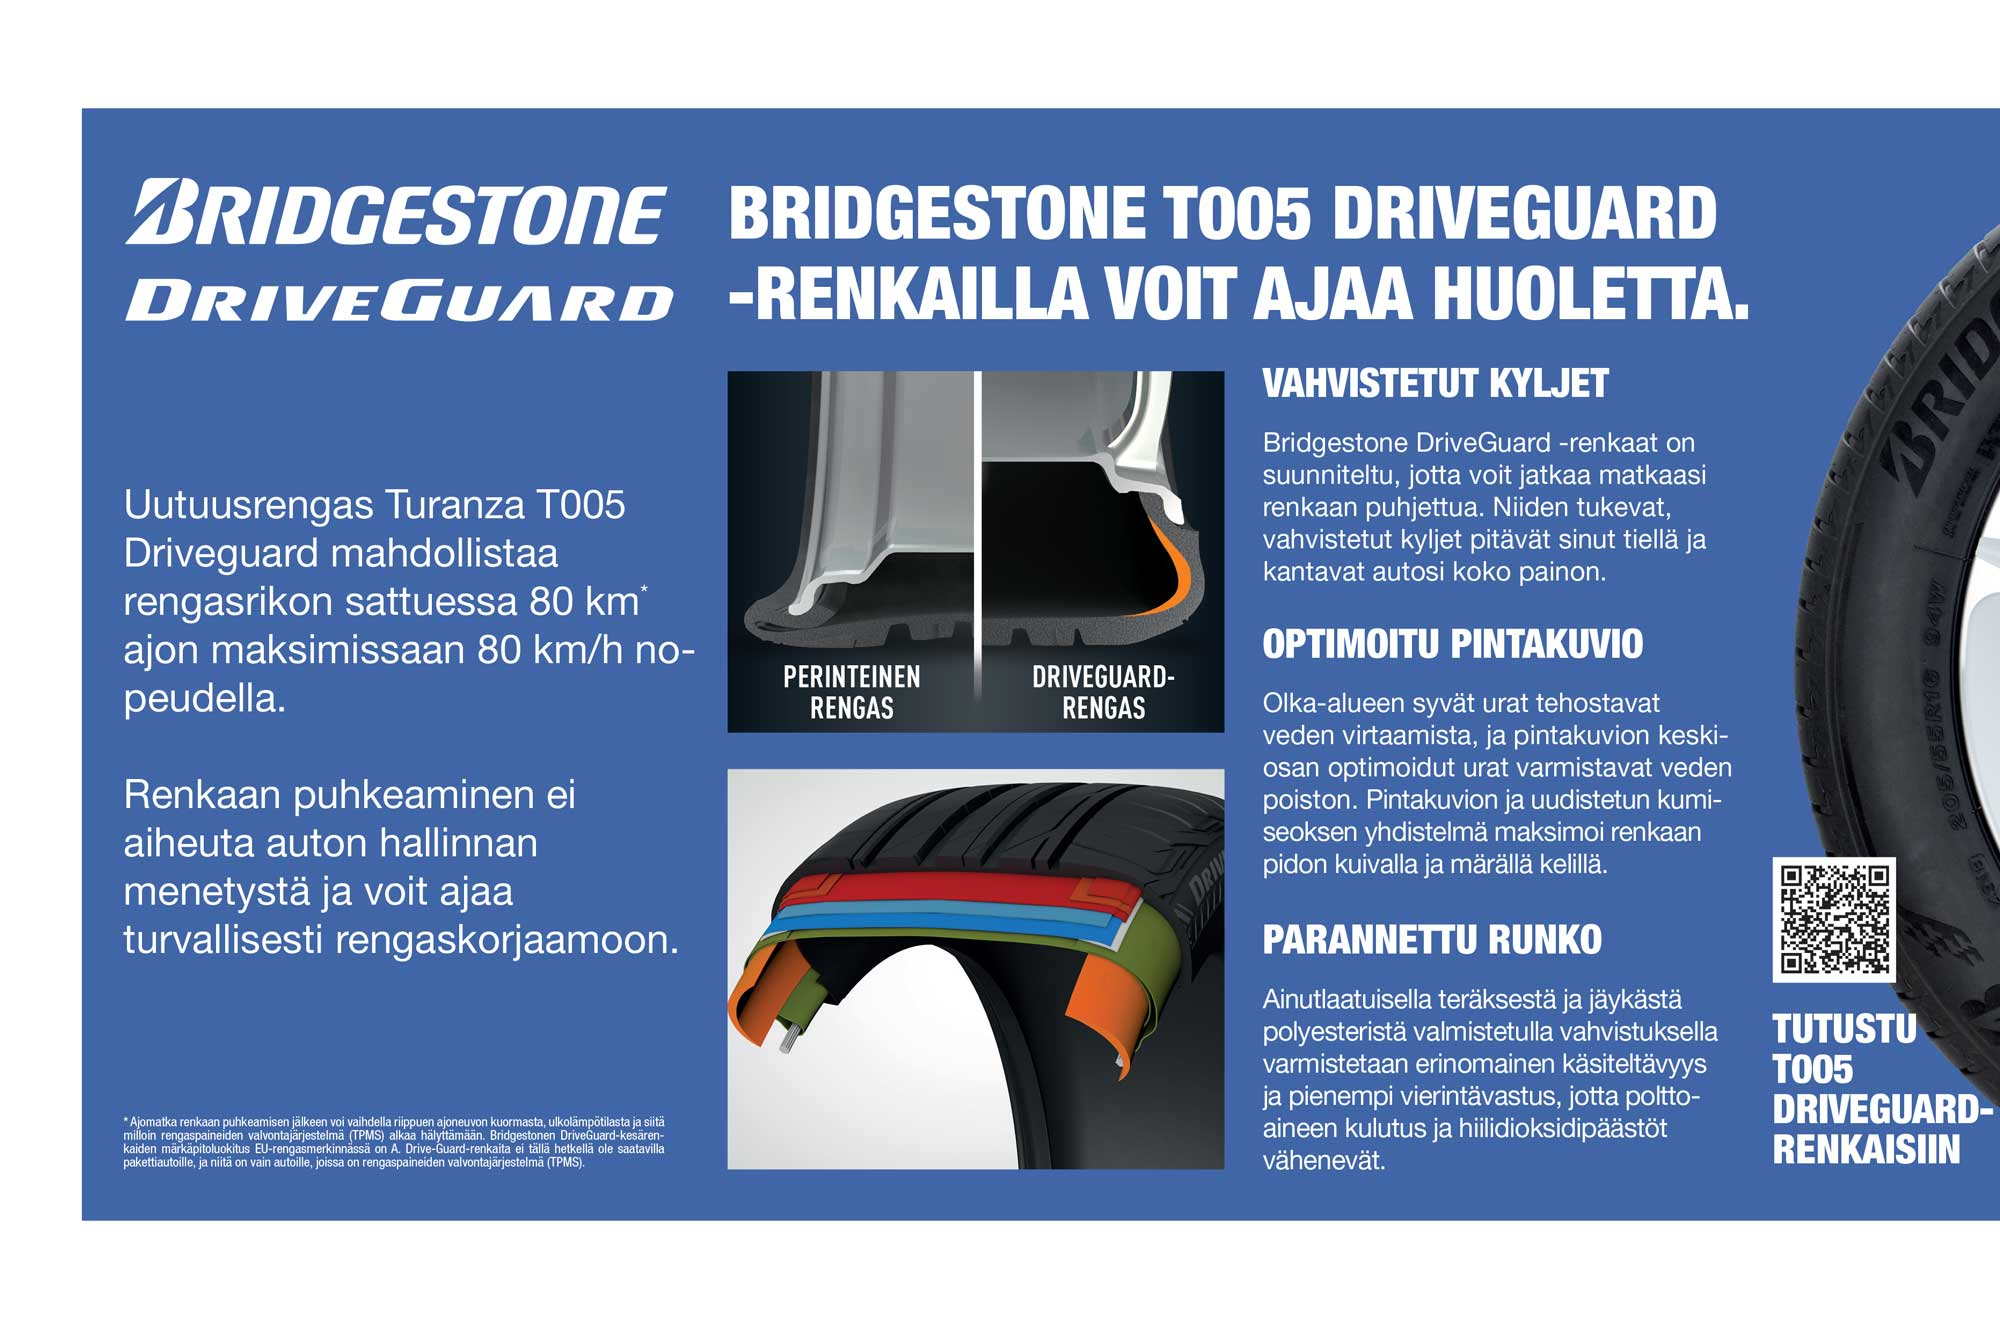 Bridgestone DriveGuard First Stop Tampere